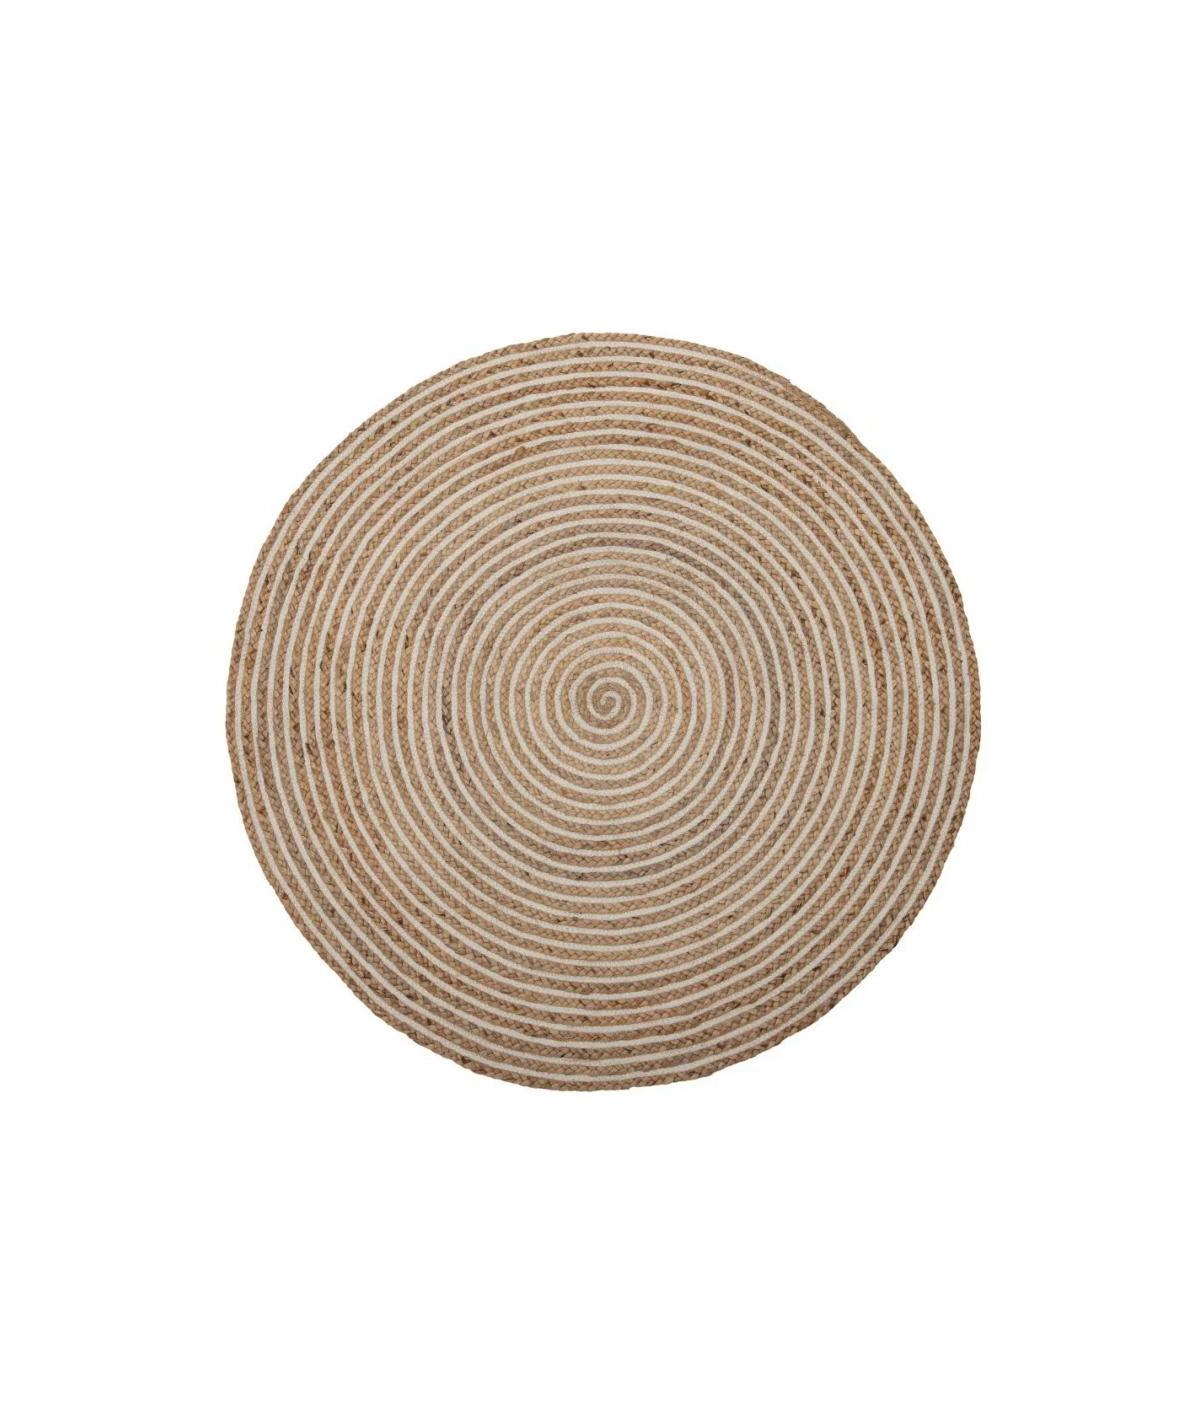 Tapis jute et coton rond beige Diam120cm - Mavina  YESDEKO